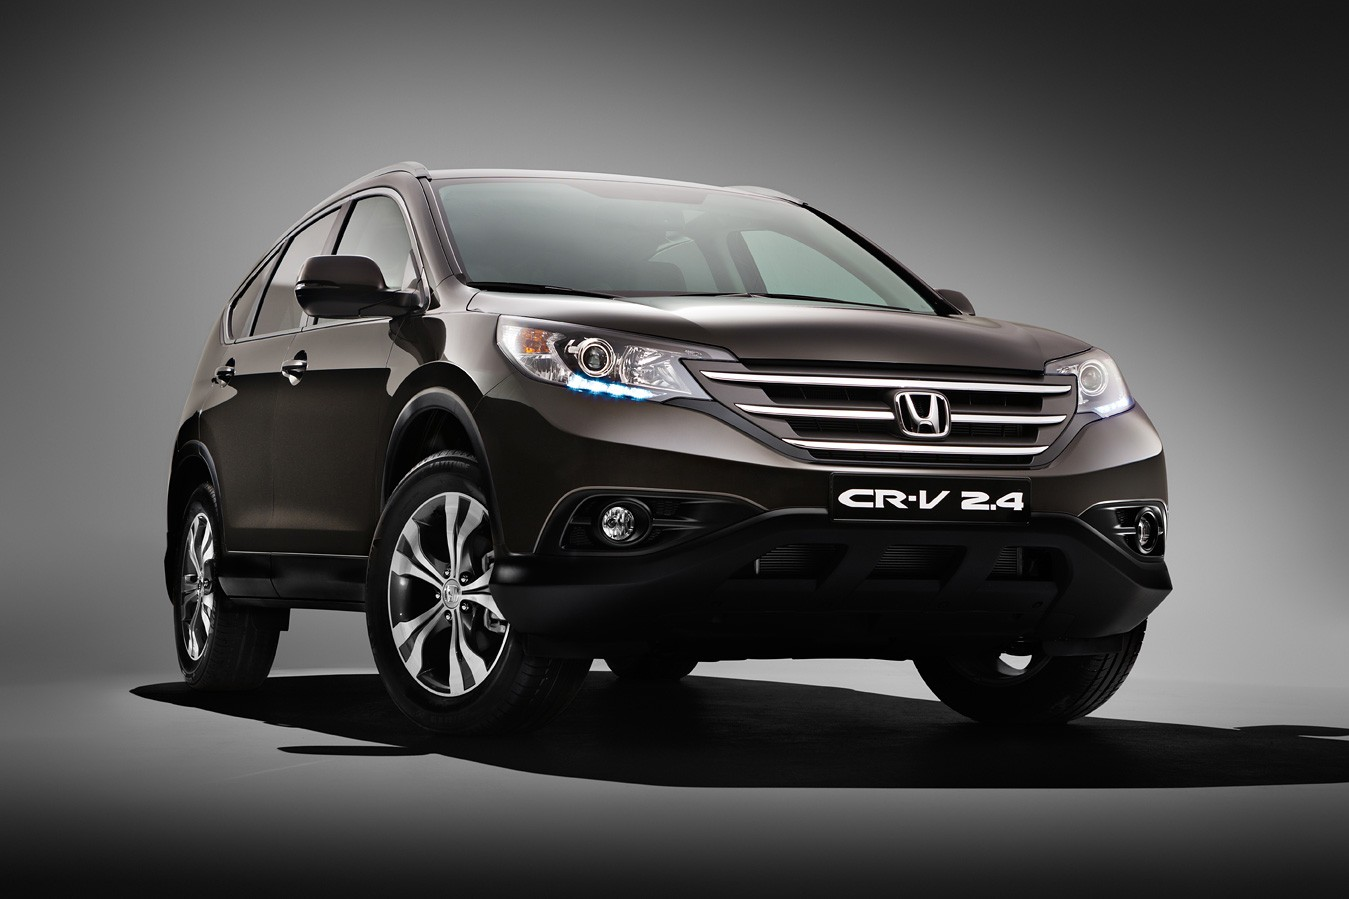 Honda начала выпускать новый CR-V 2017